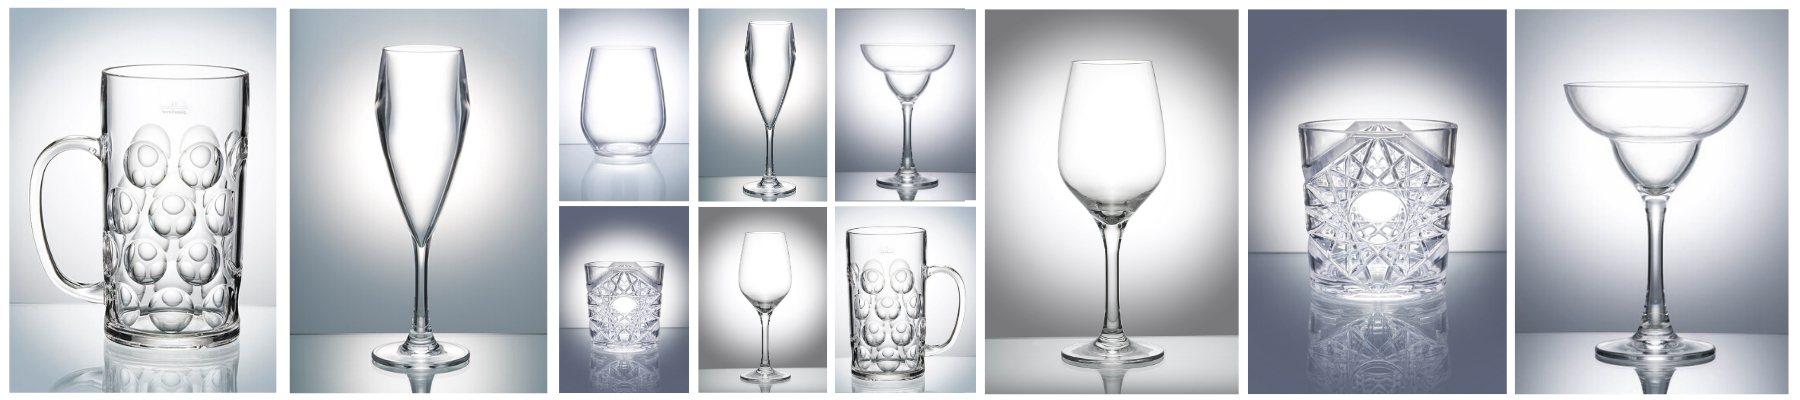 Reusable Plastic Glasses